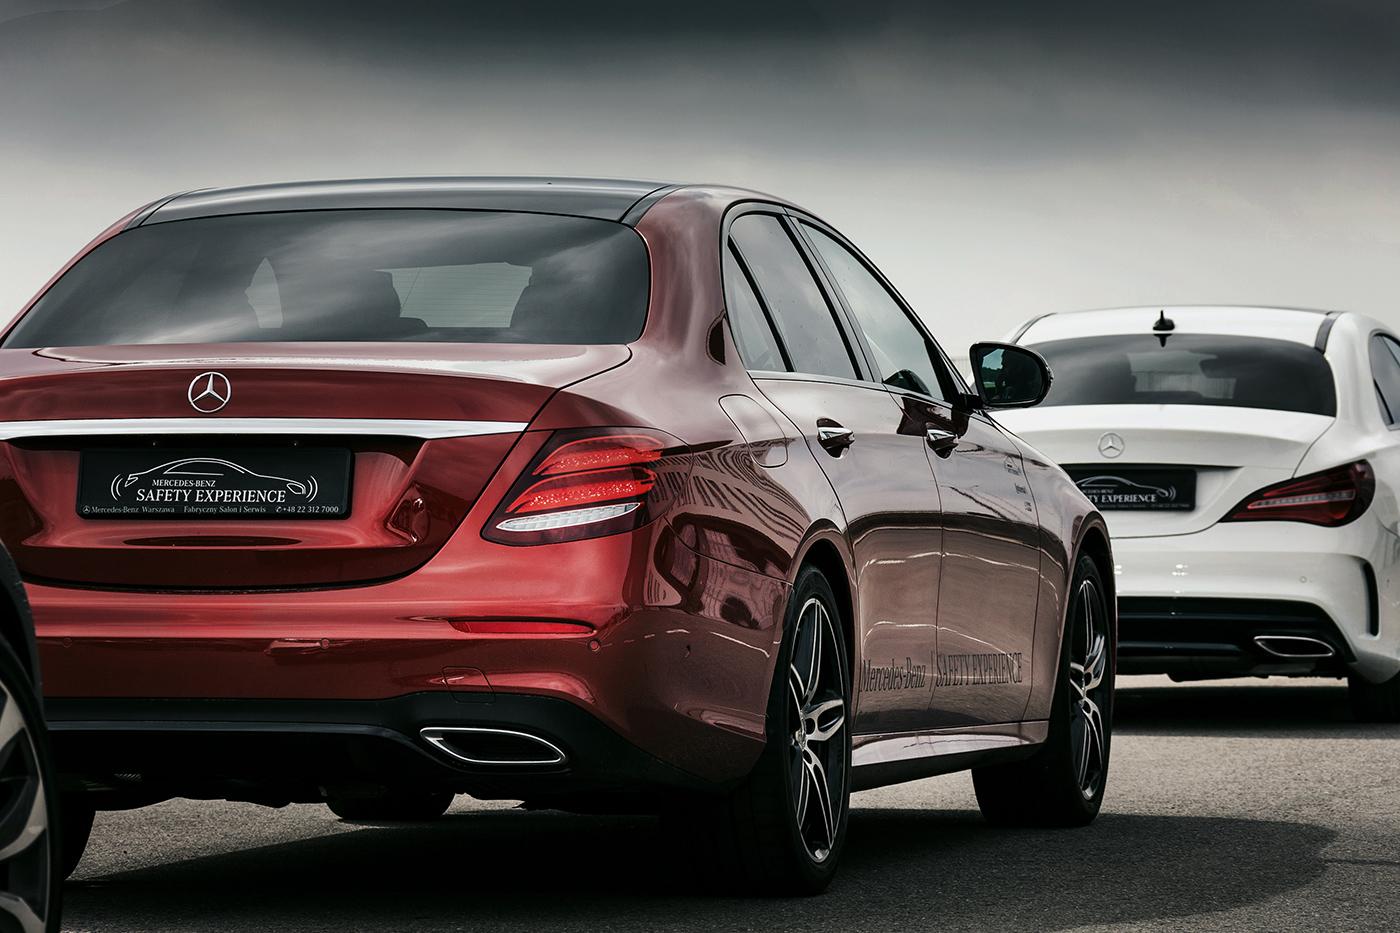 Mercedes Benz Safety Experience Autodrom Jastrząb